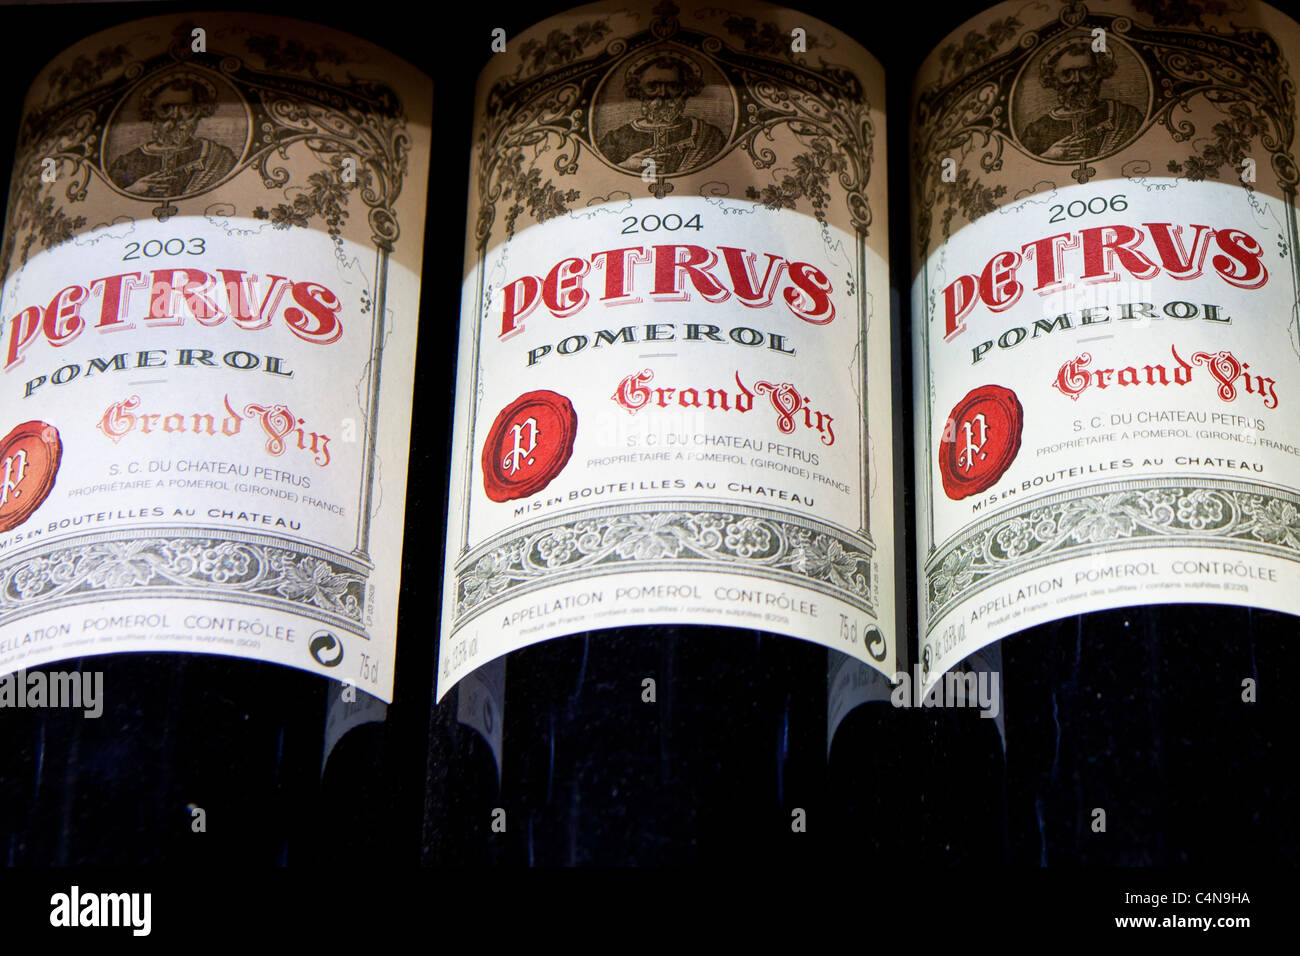 Chateau Petrus Fine Wine Vintage 2003 2004 2006 Grand Vin On Sale